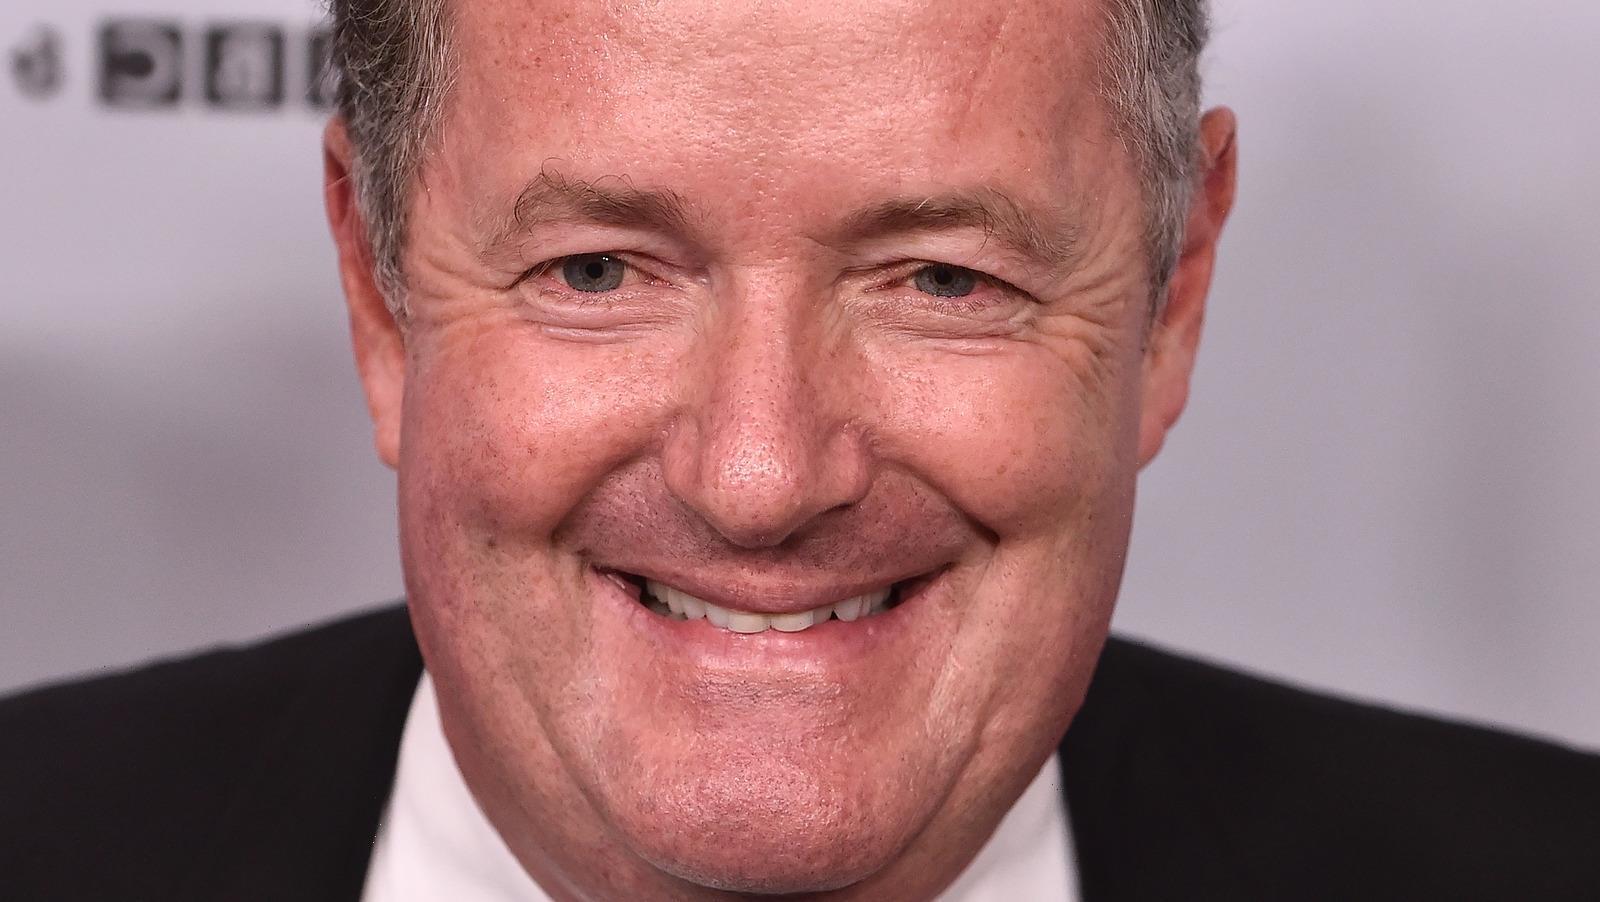 The Surprising Way Piers Morgan Set A World Record